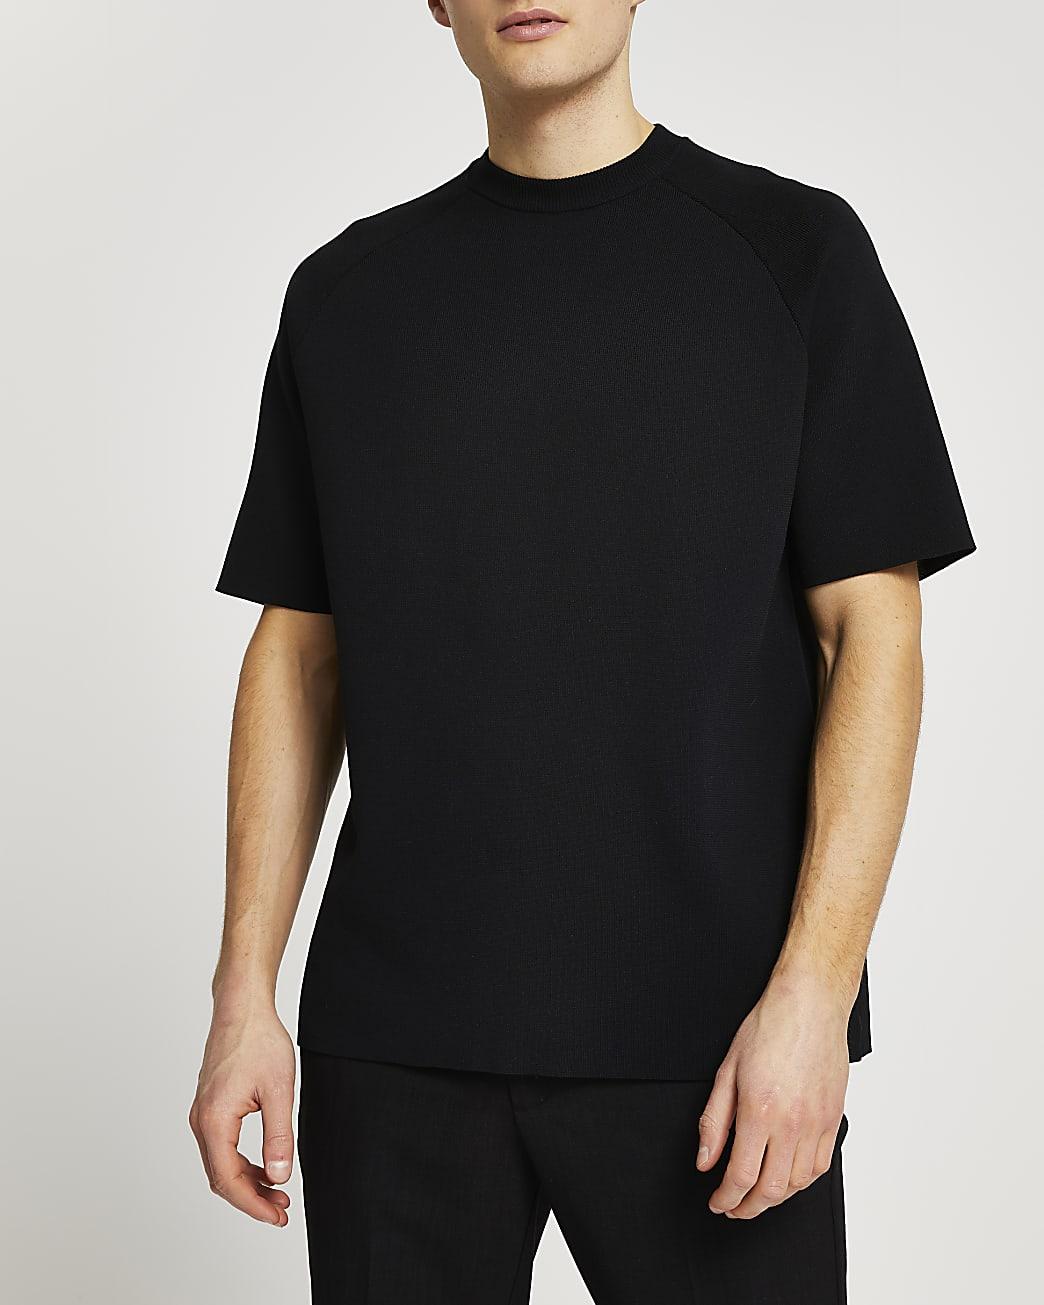 Black oversized knitted t-shirt